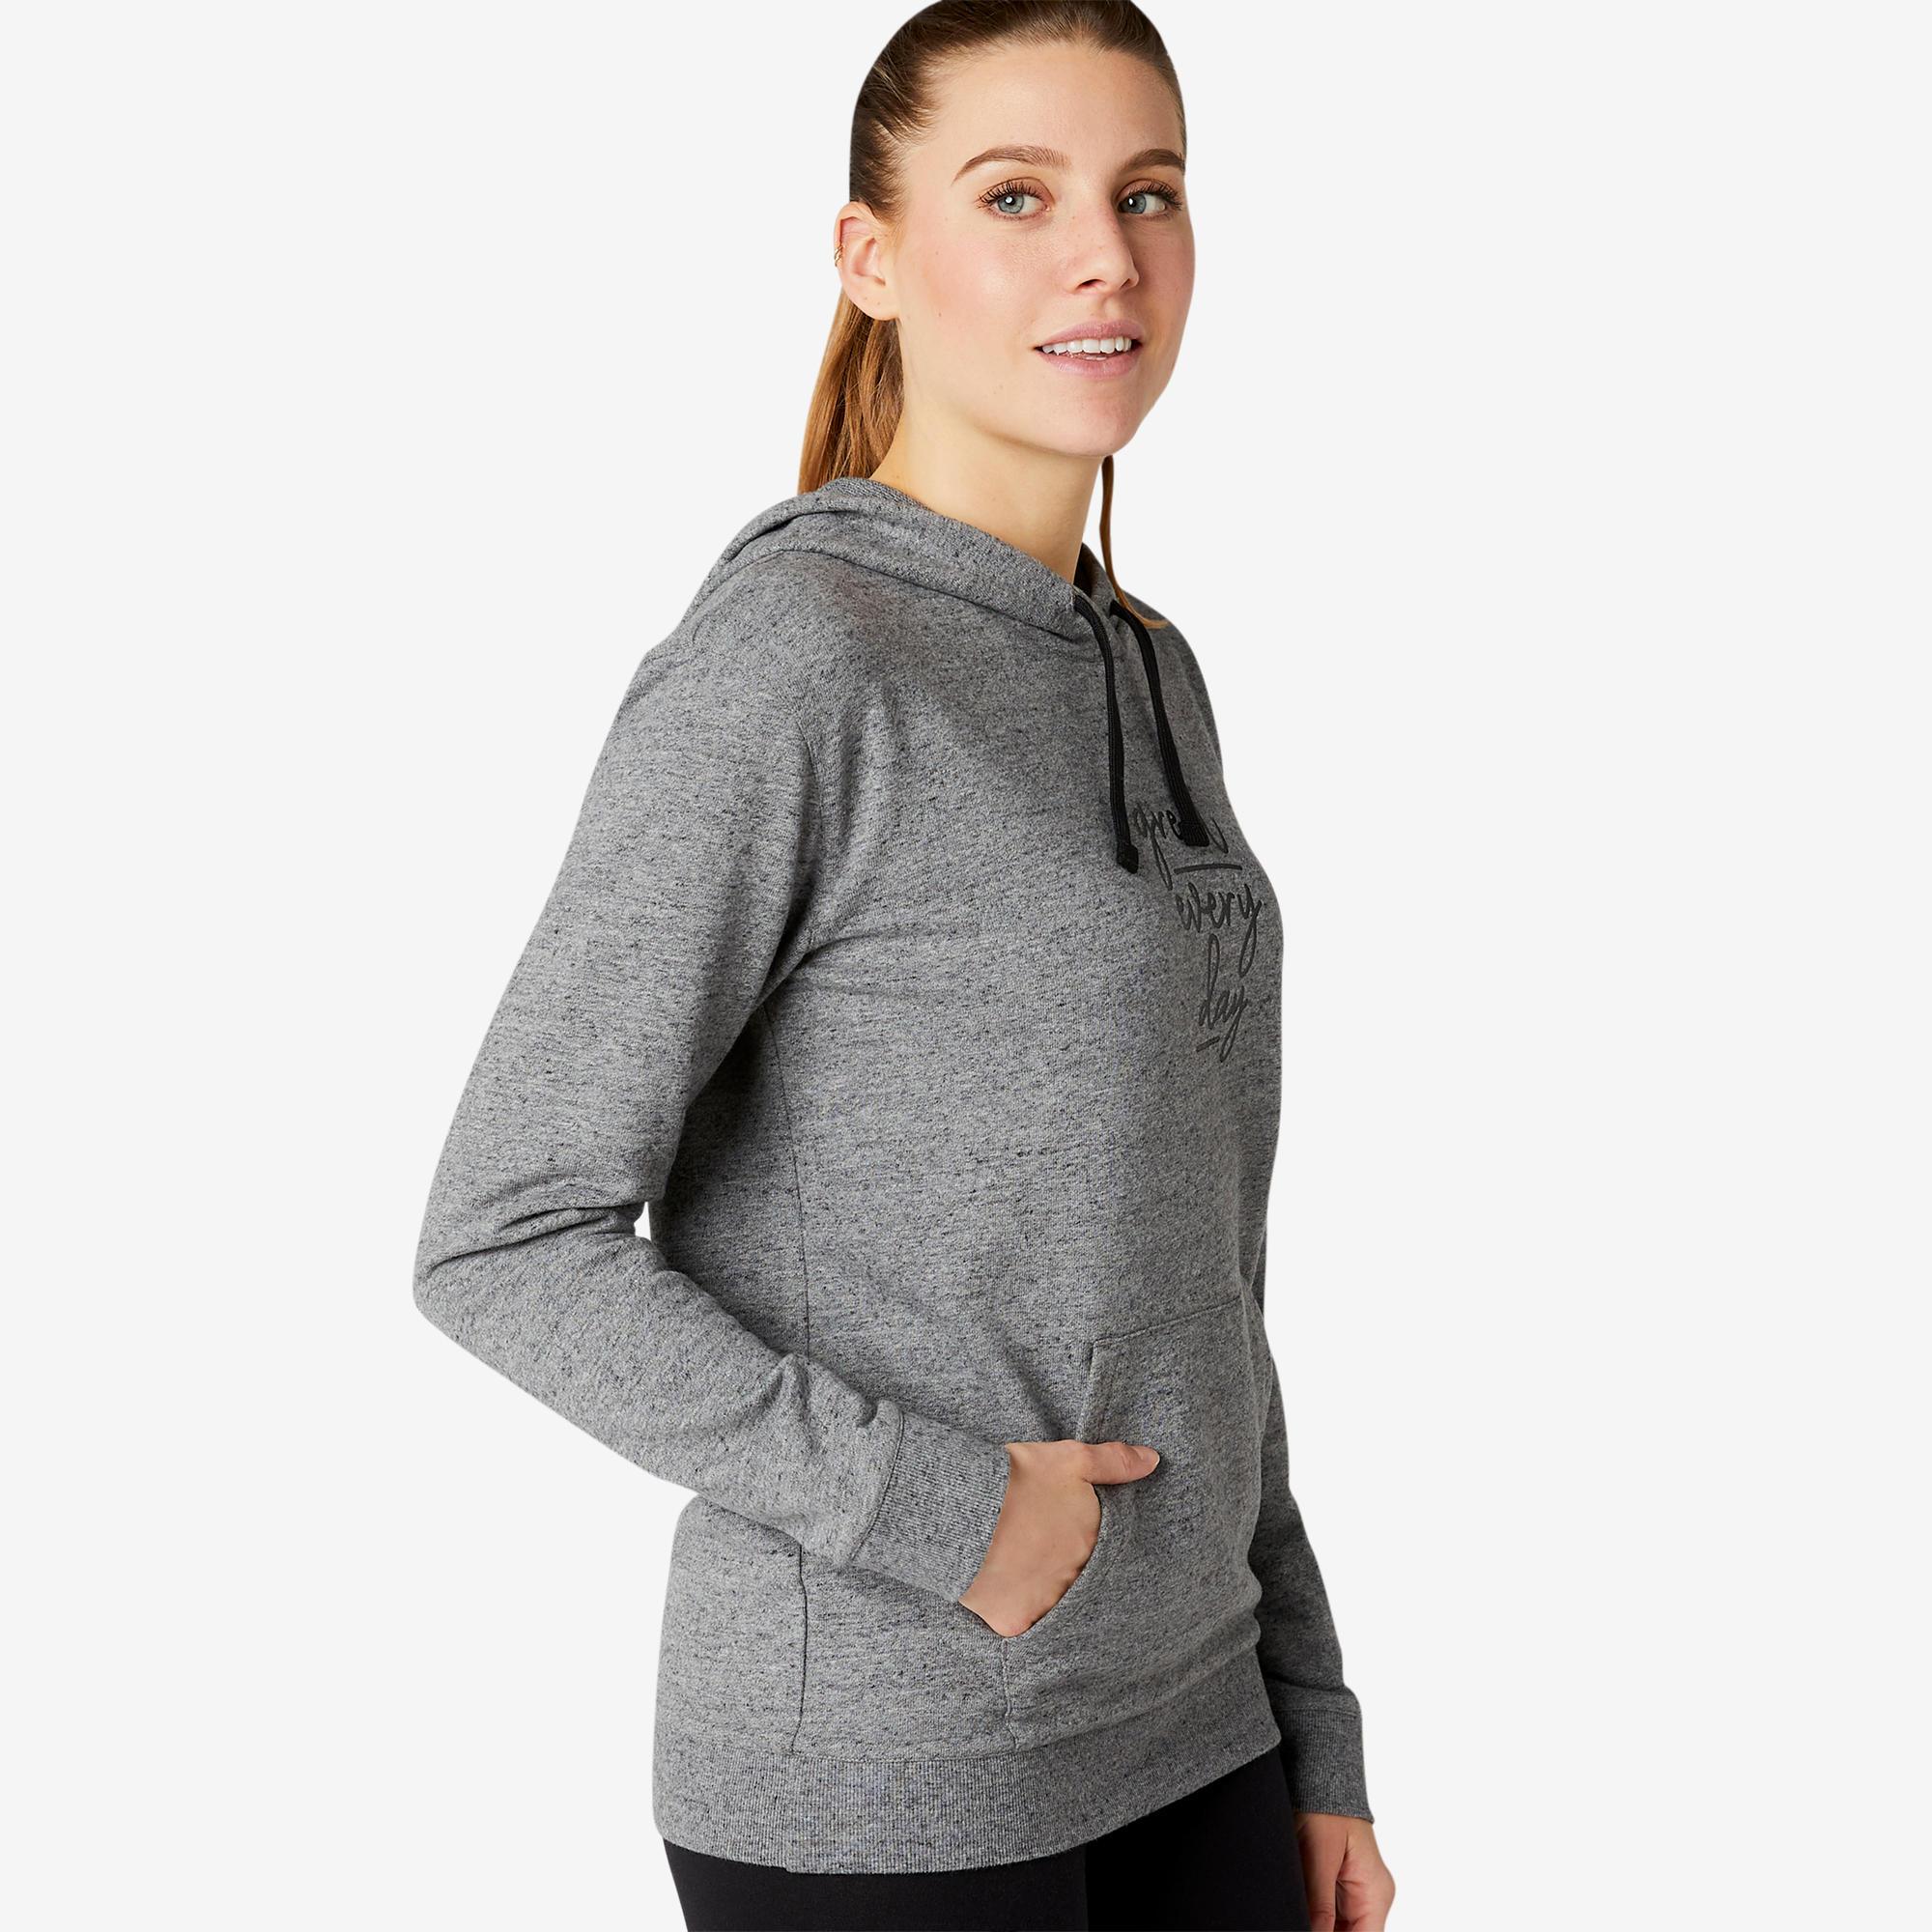 Sweatshirt Grau Damen